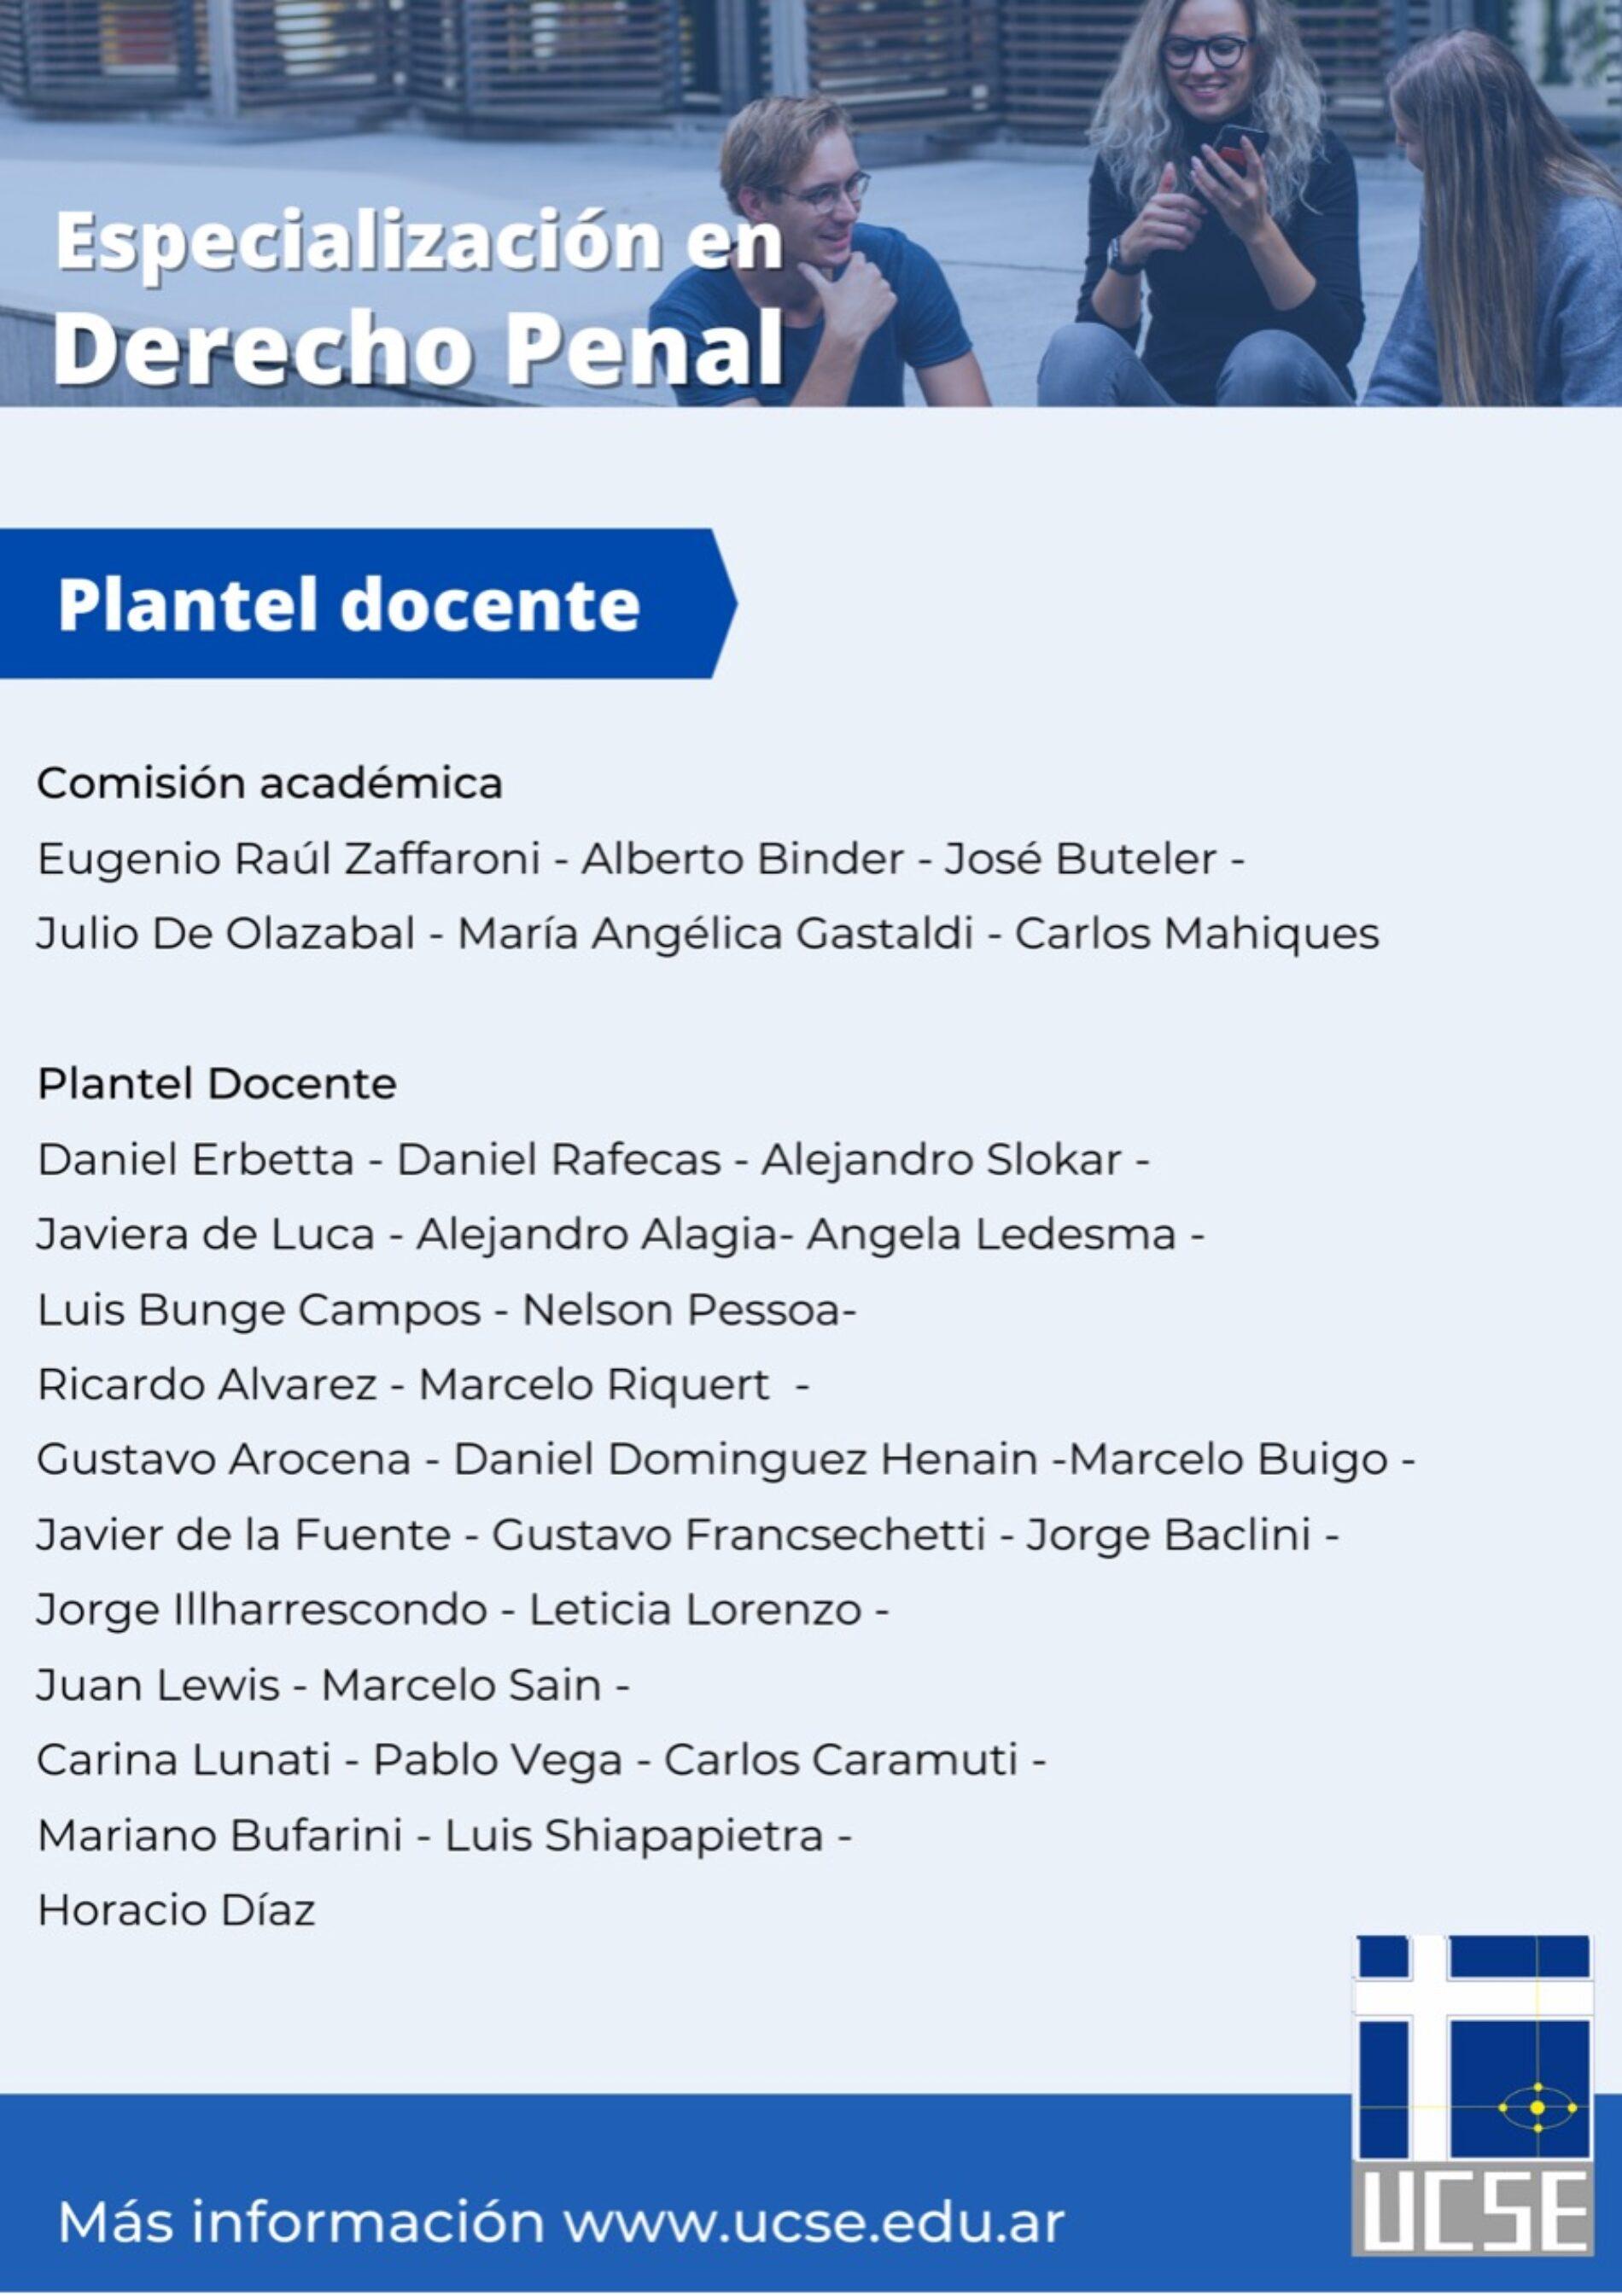 Especialización en Derecho Penal. U.C.S.E -sede Buenos Aires-.